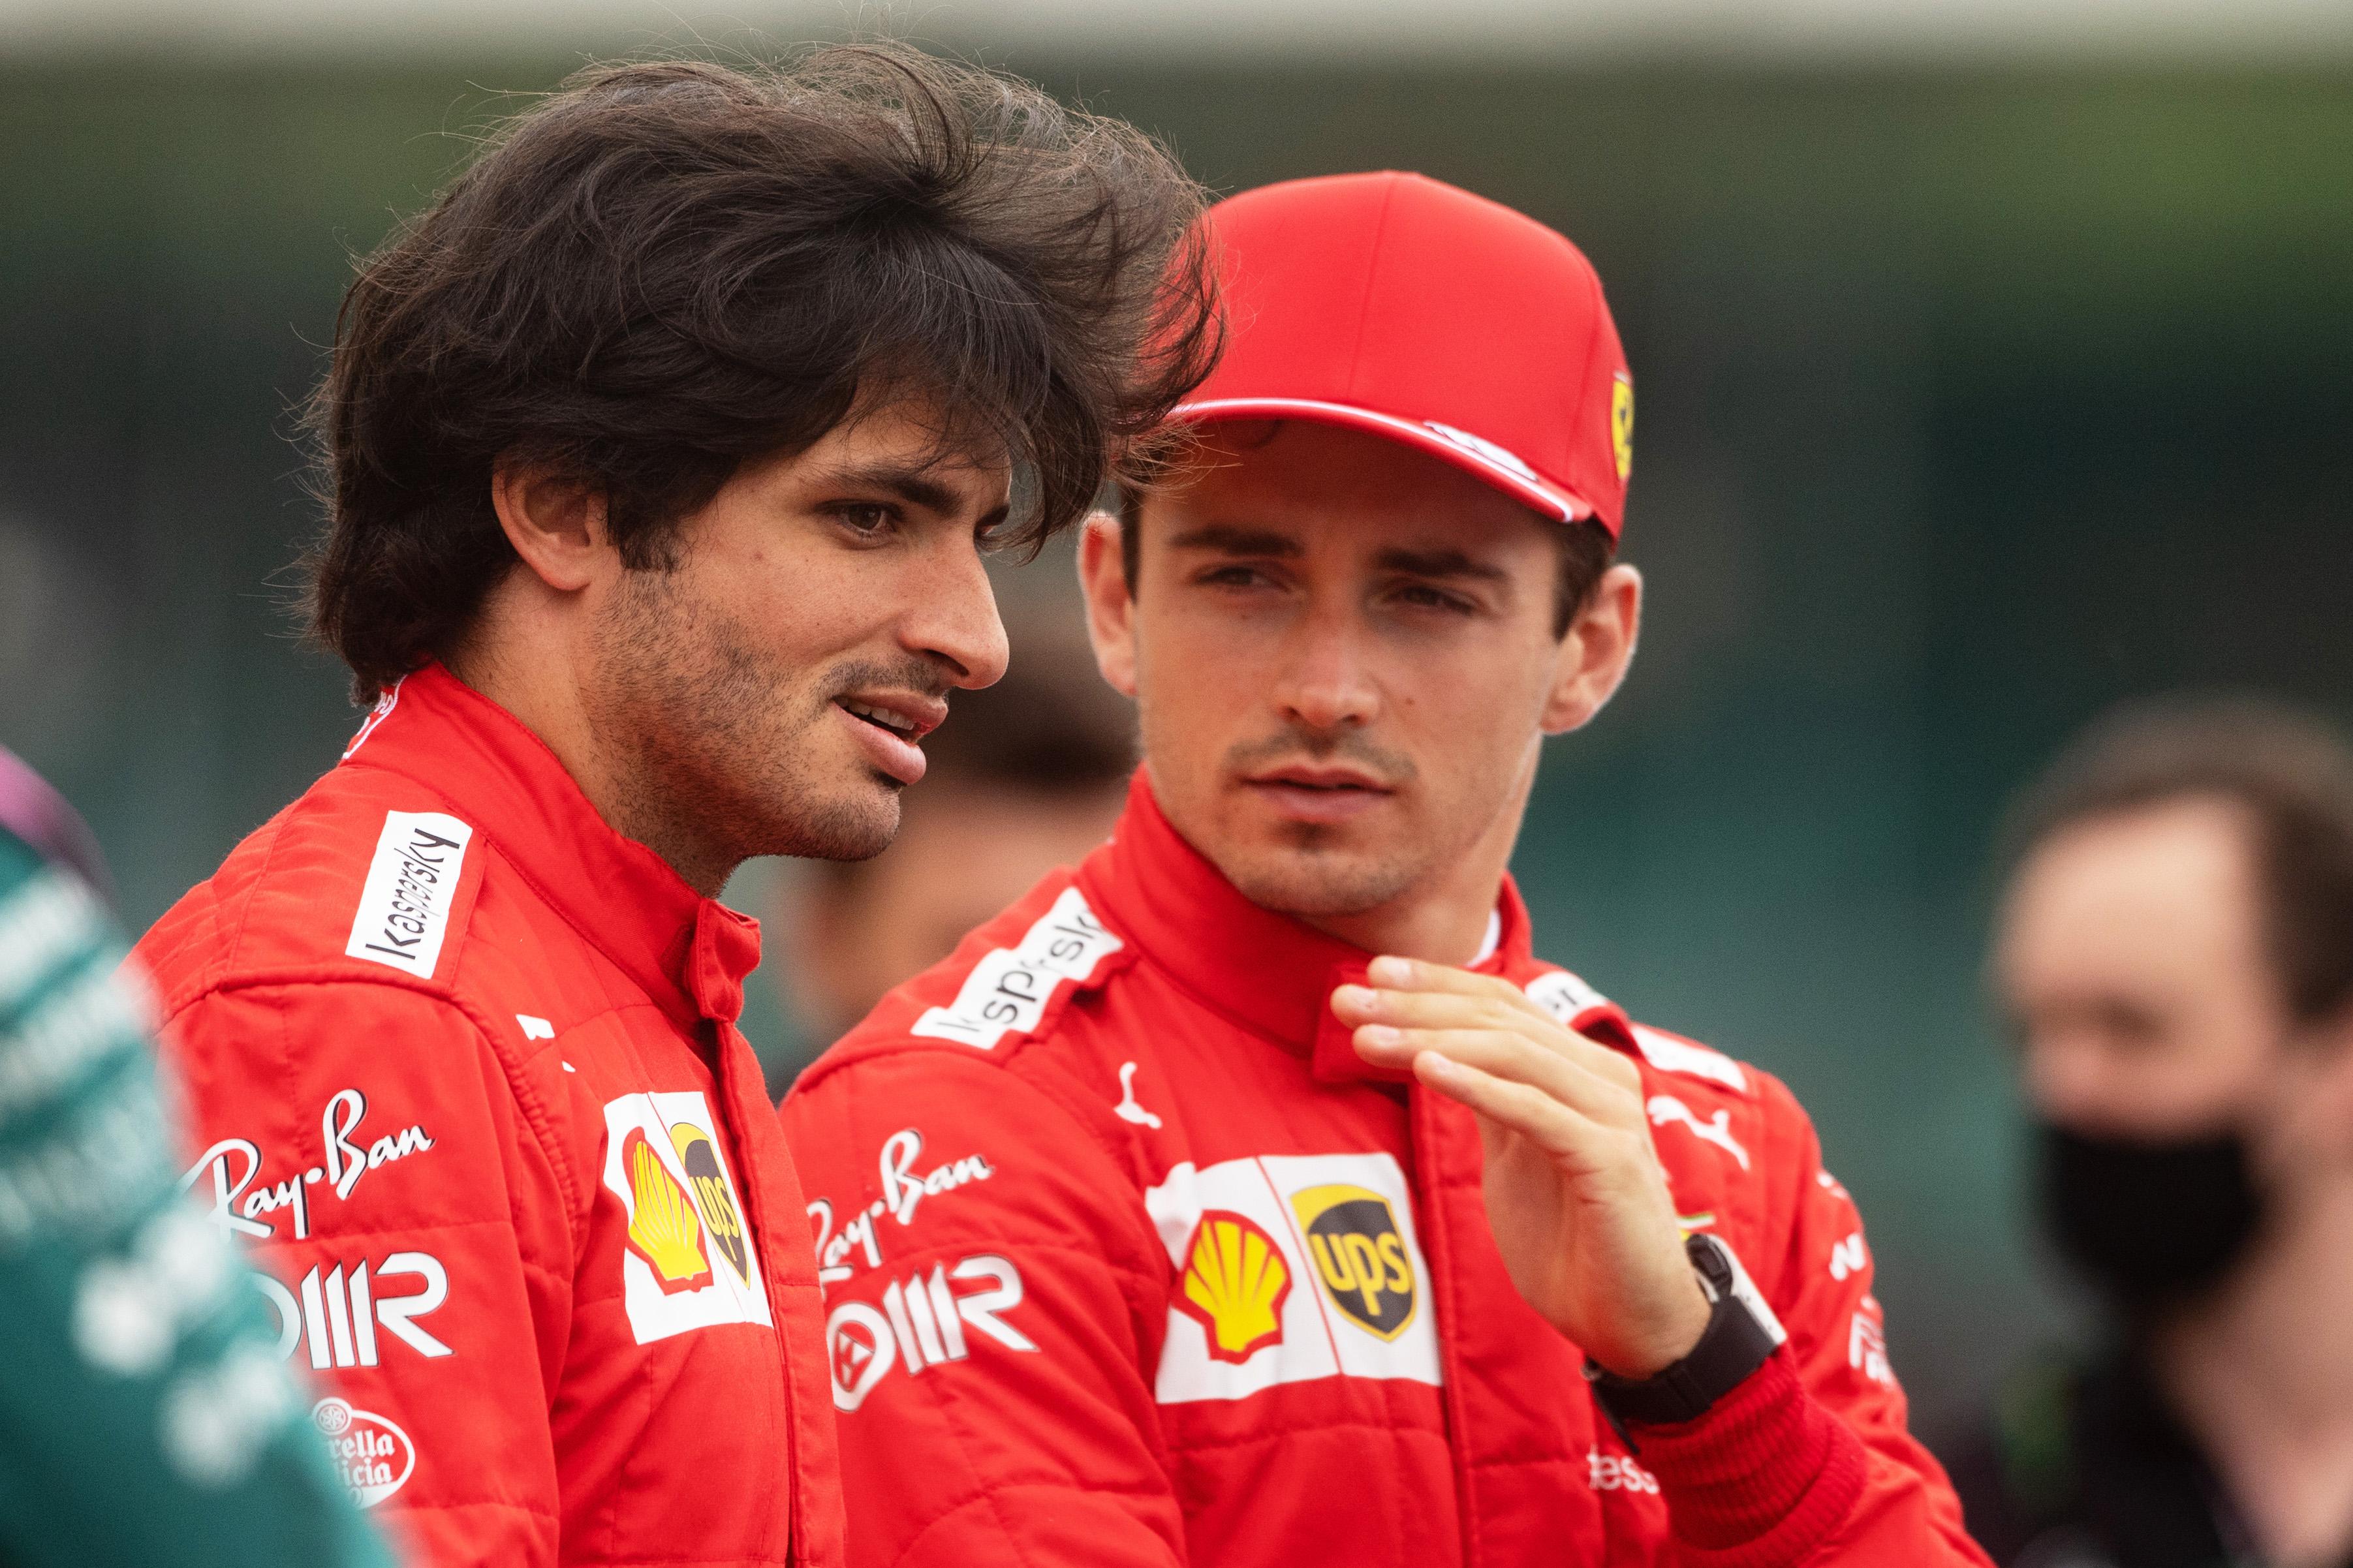 Carlos Sainz i Charles Leclerc - Ferrari